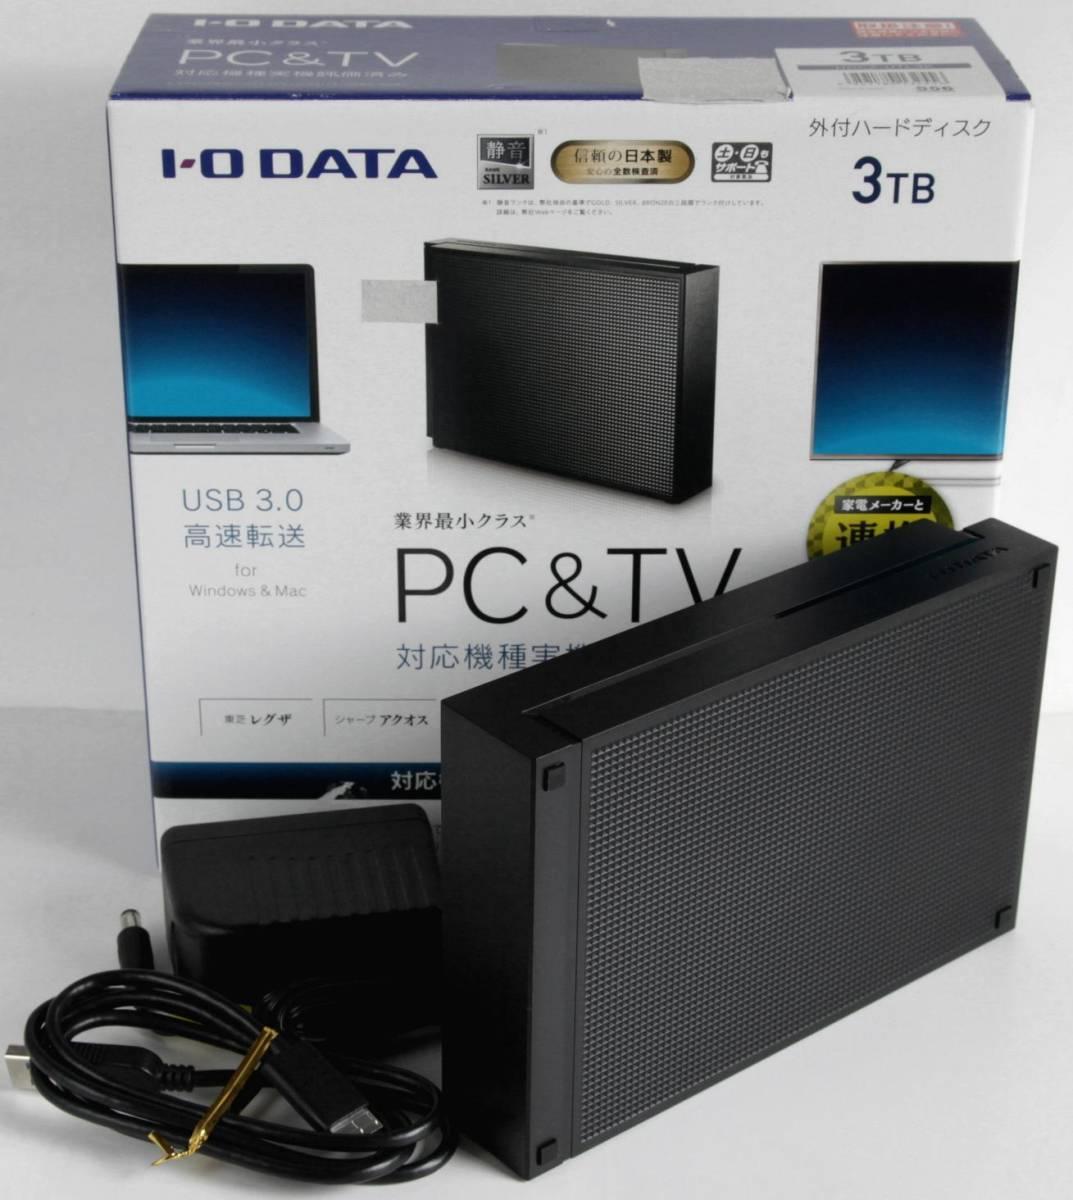 □◇I・O DATA USB3.0対応 HDCZ-UTL3K 3TB_画像2